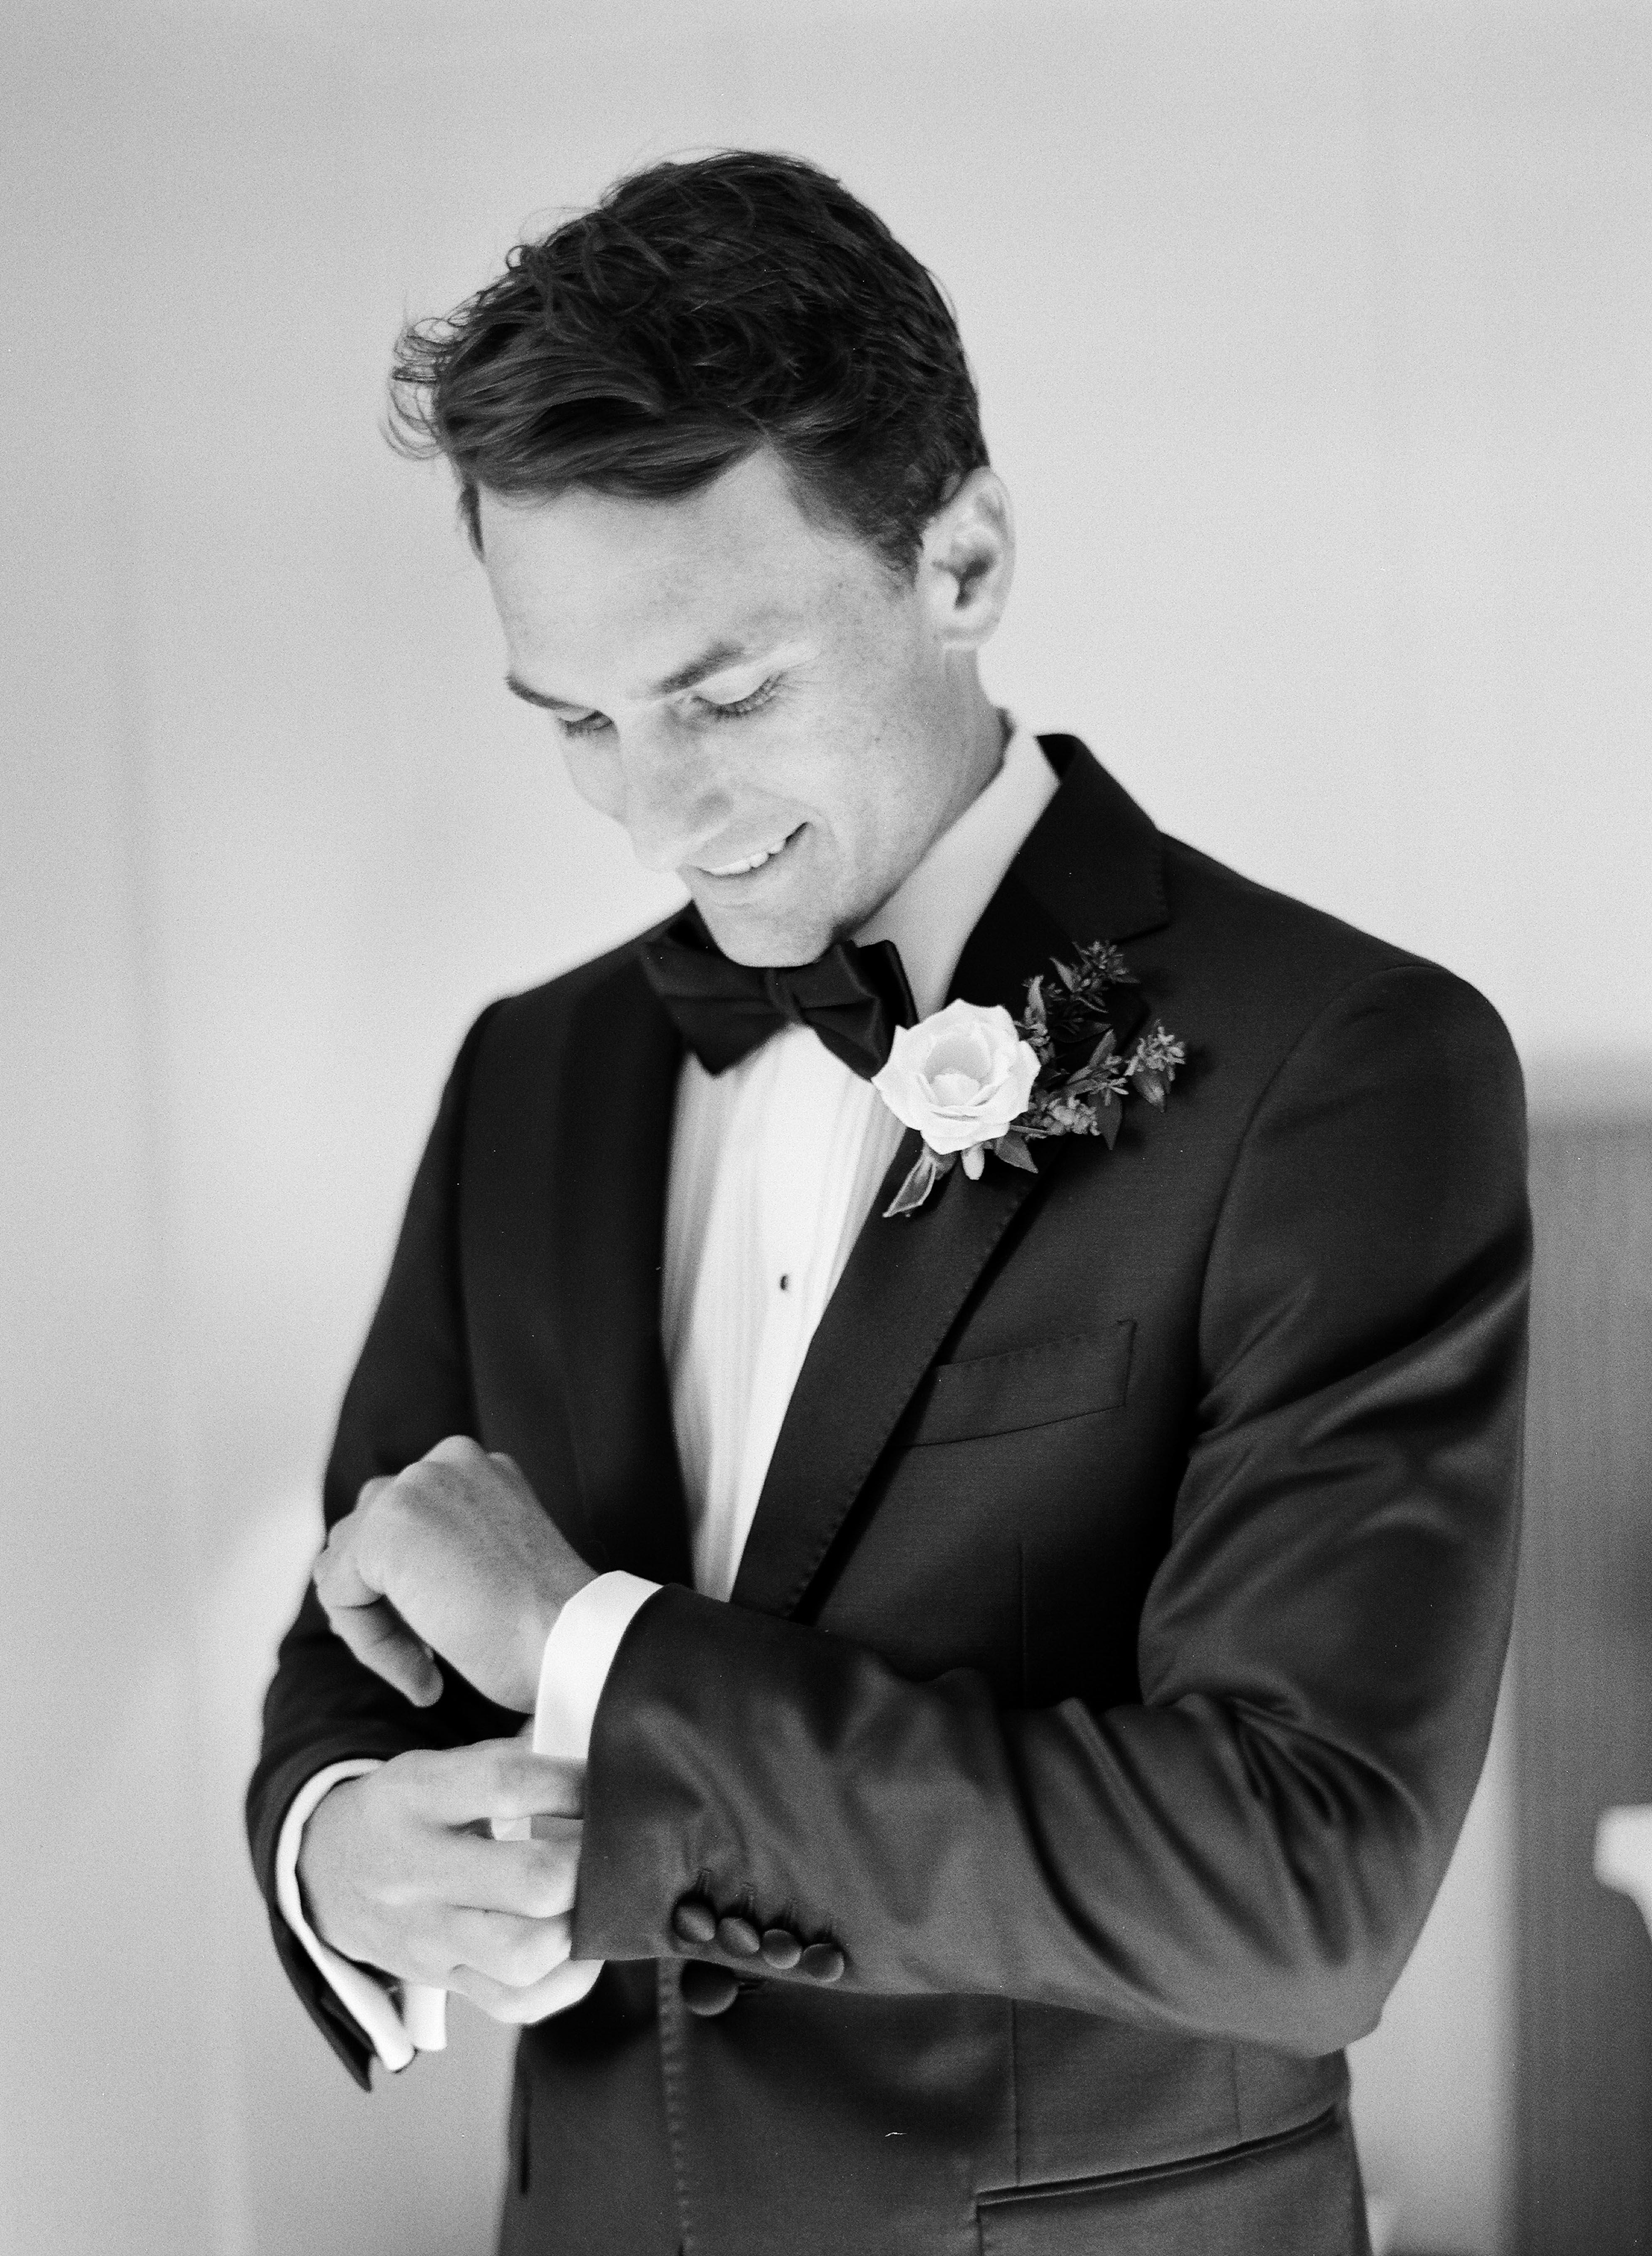 caitlin michael wedding groom